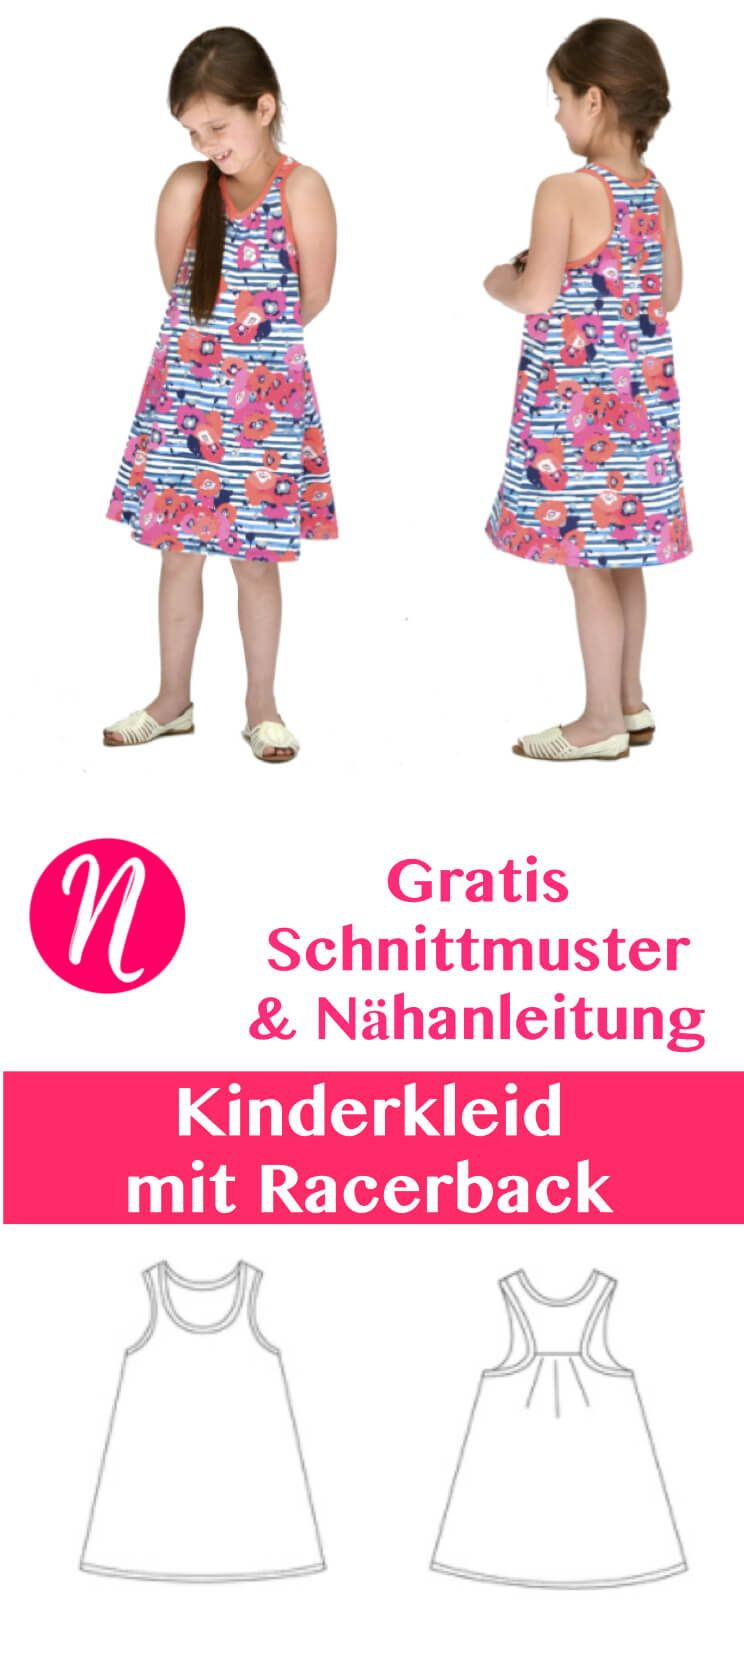 Kinderkleid mit Racerback - Jerseykleid zum selber nähen #sewins